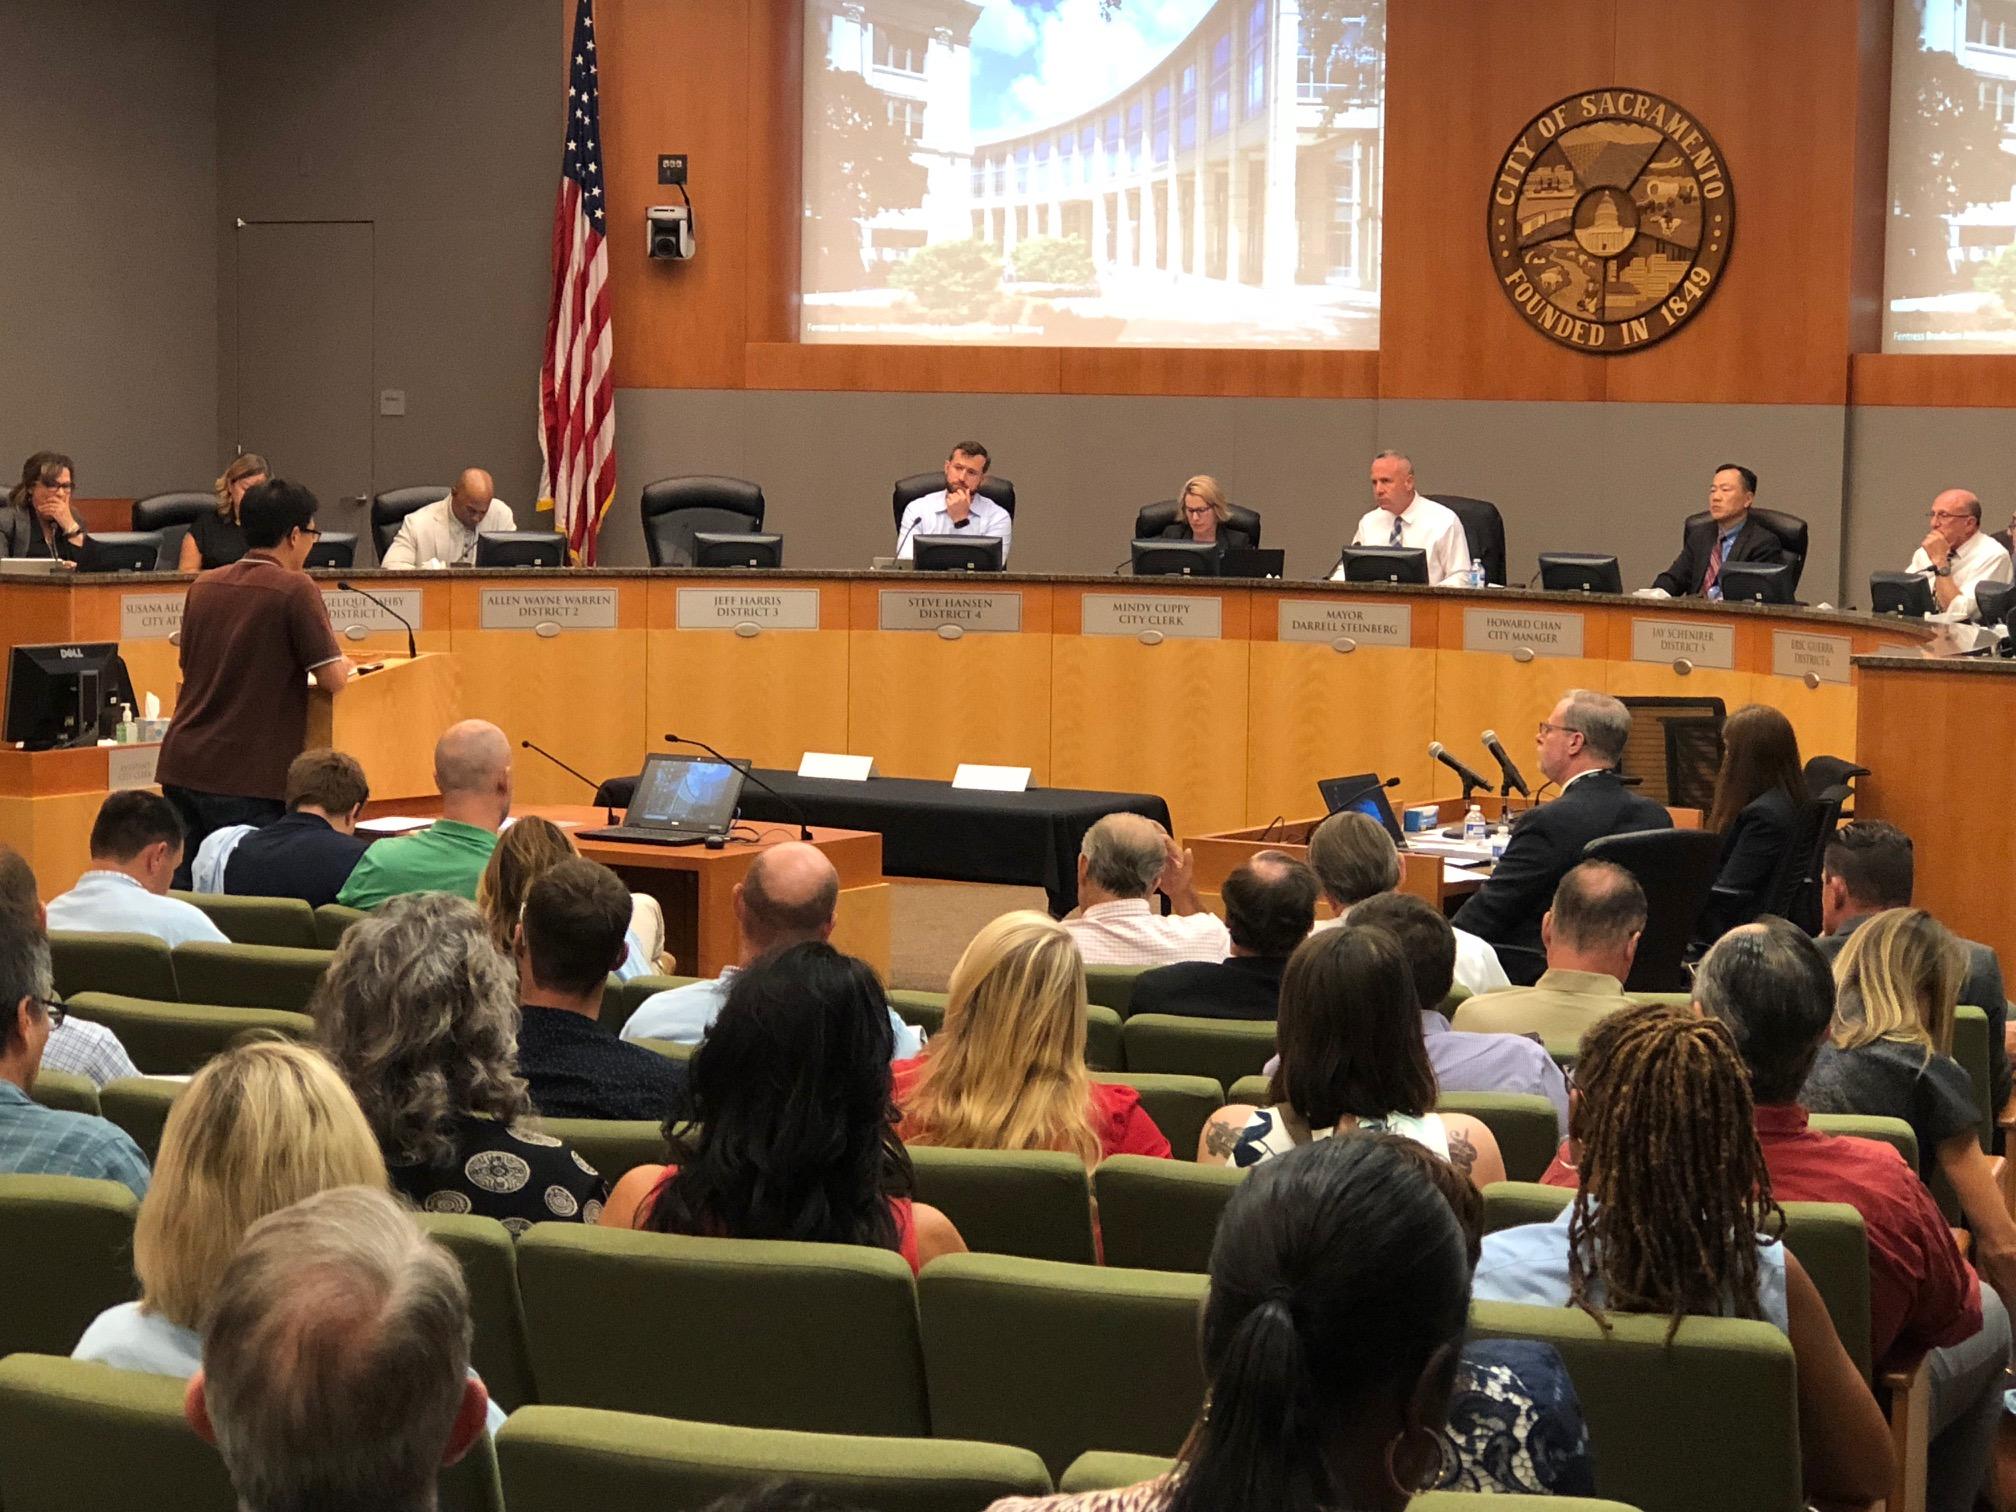 The City Council debates rent control at a 2018 meeting